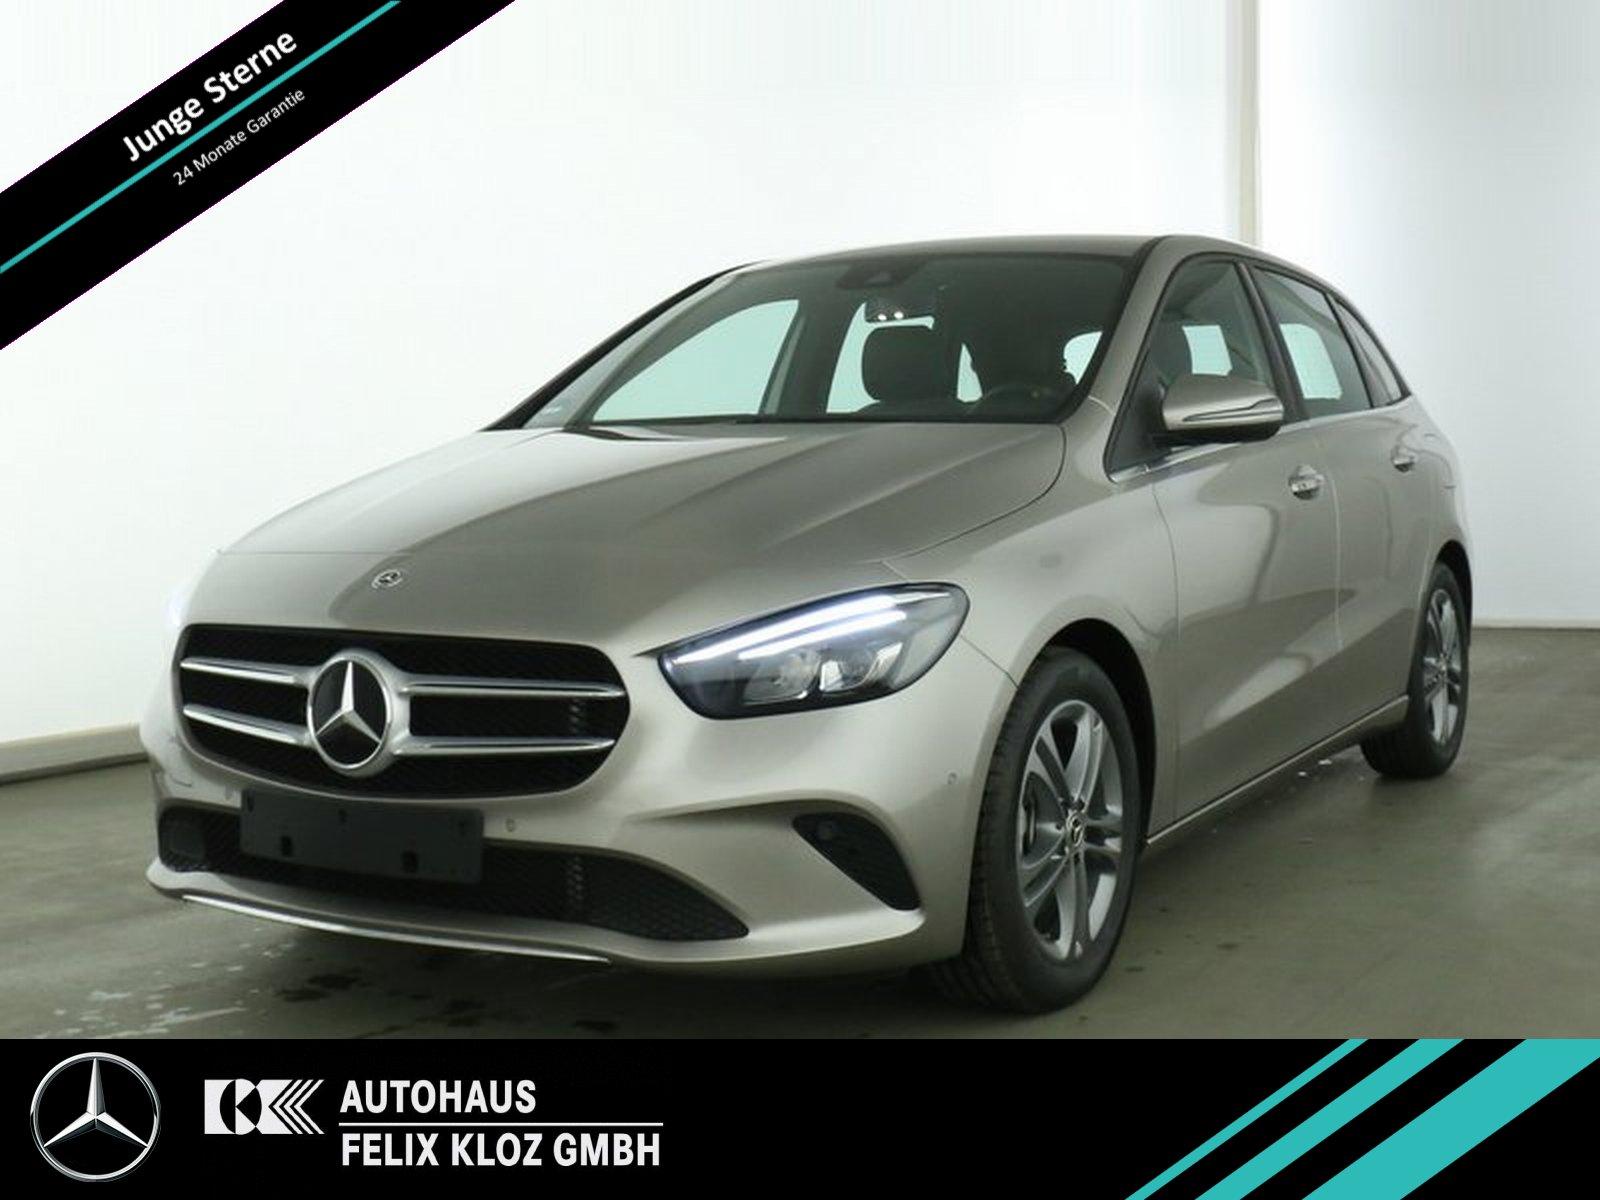 Mercedes-Benz B 200 Style Navi*Kamera*LED*Sitzheizung*PRE-SAFE, Jahr 2019, Benzin